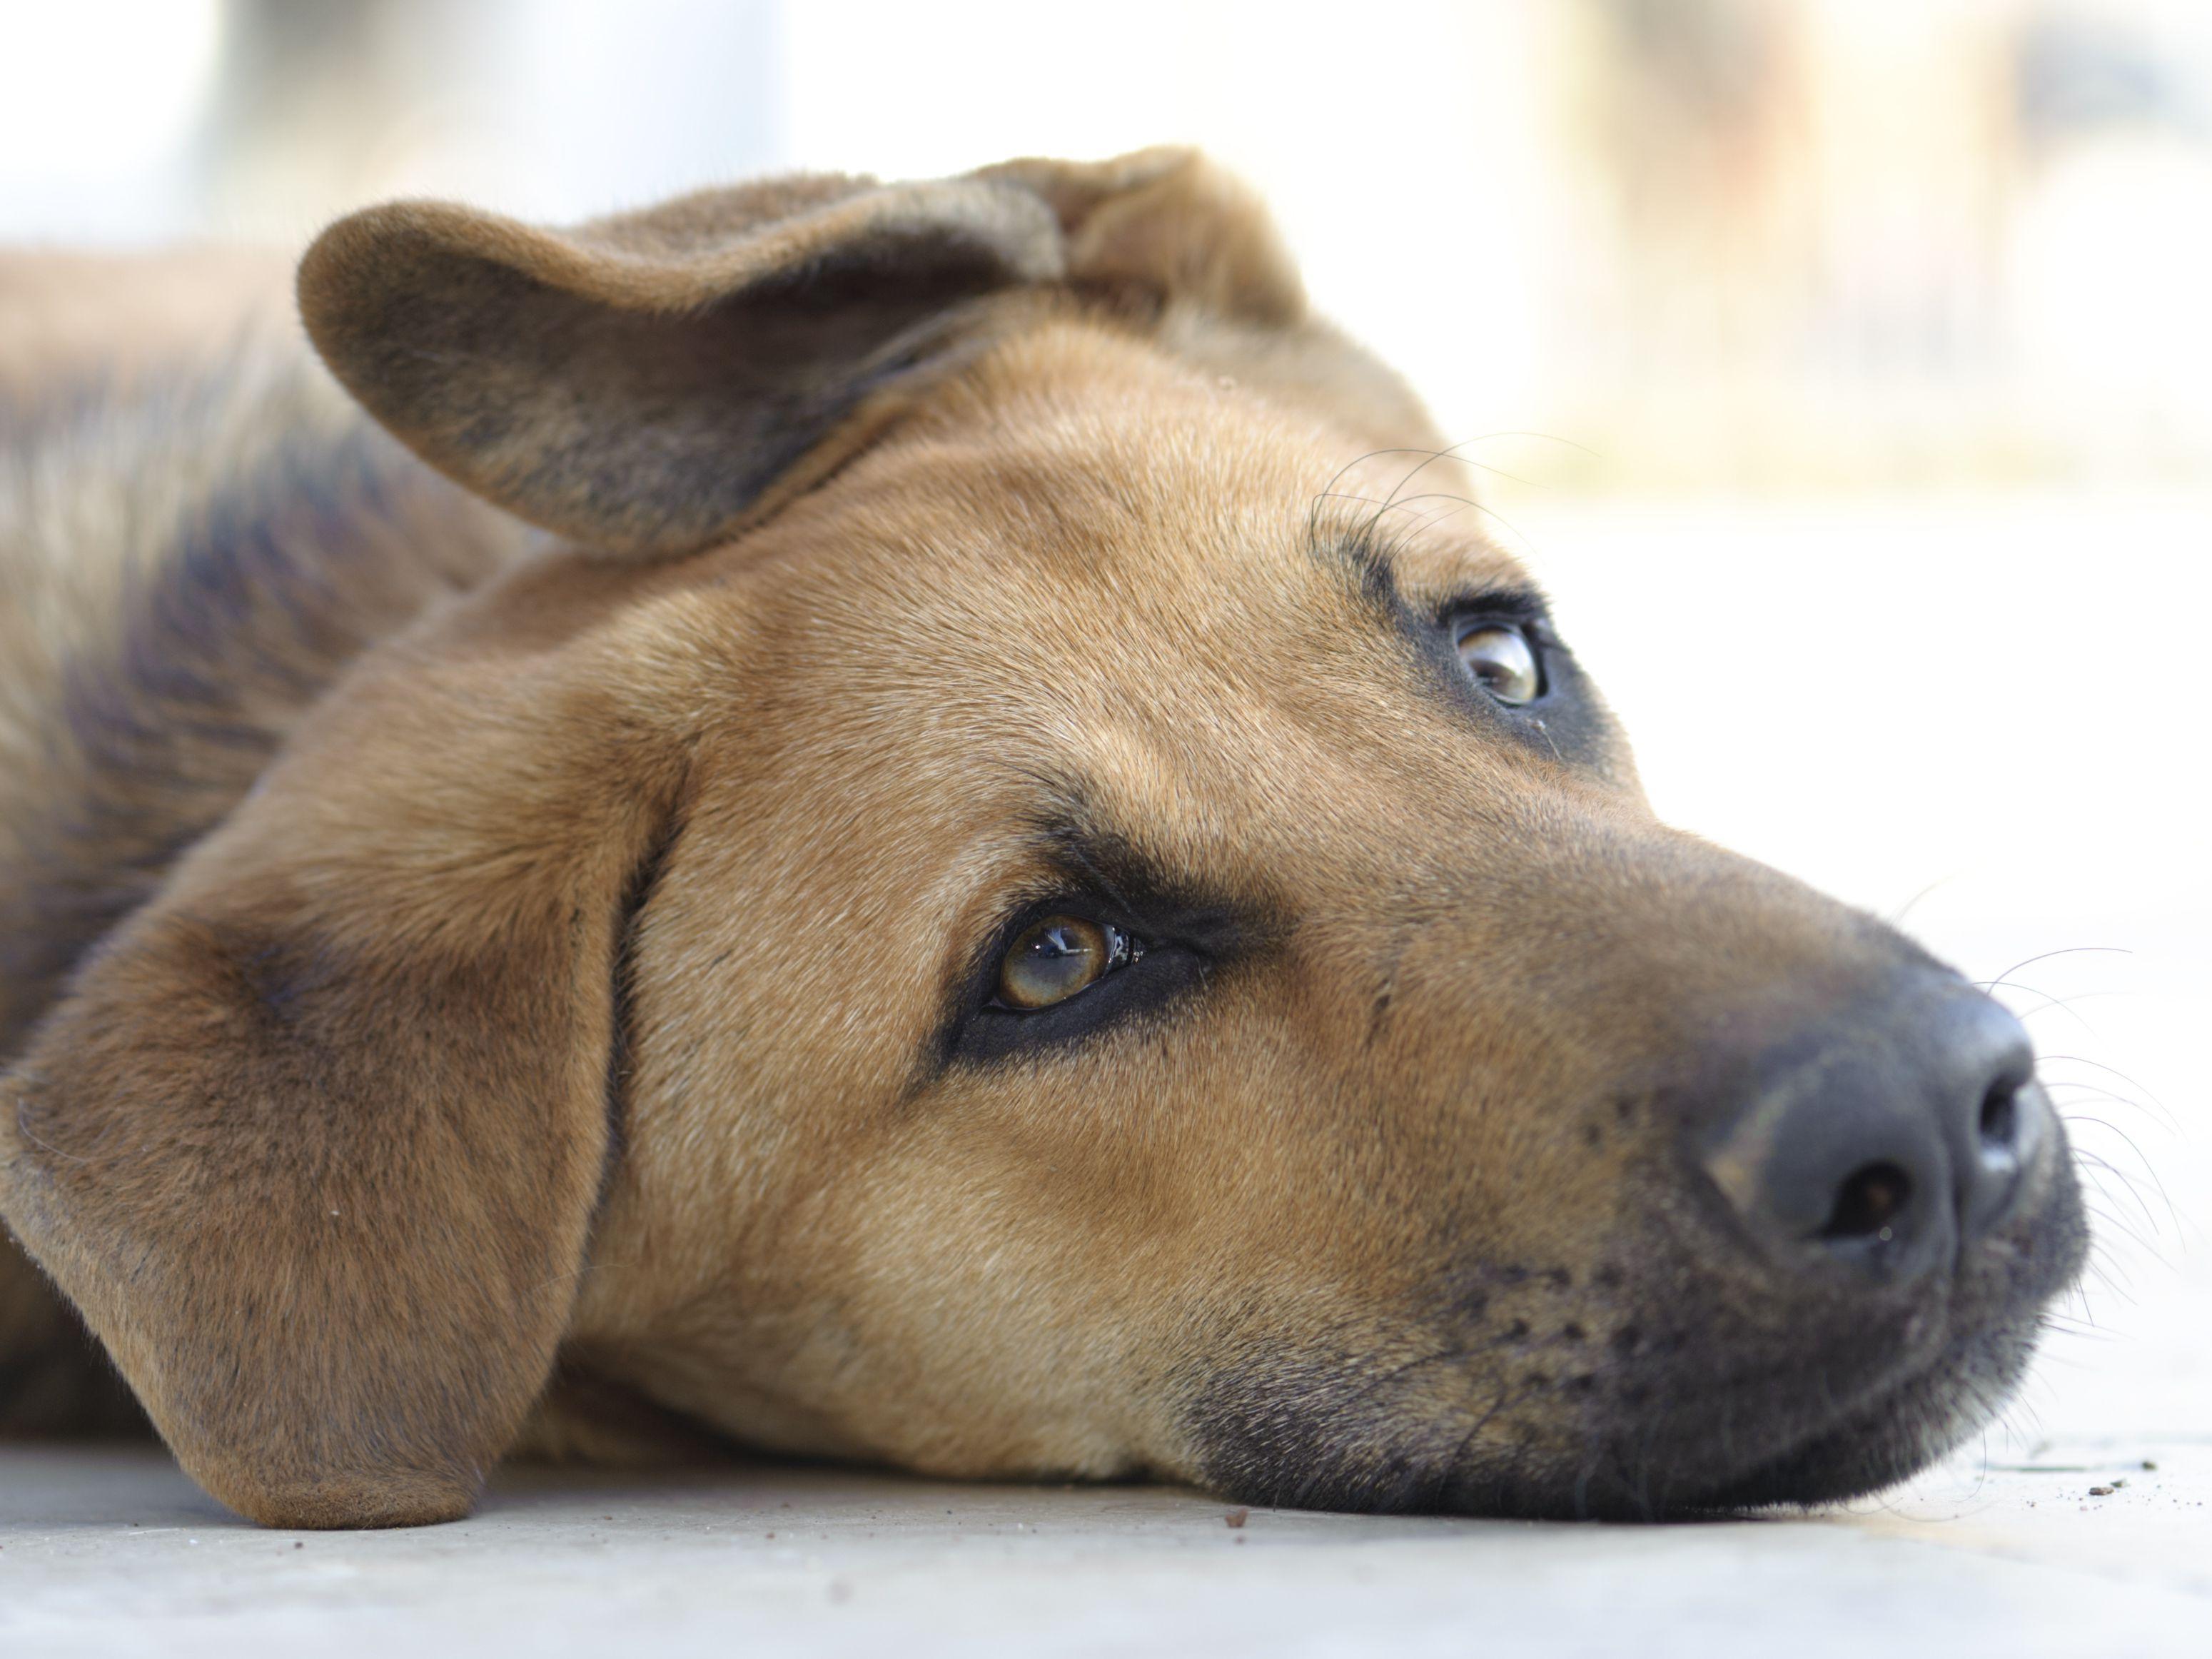 My Pet Is Sick, and I Can't Afford to Go to the Vet